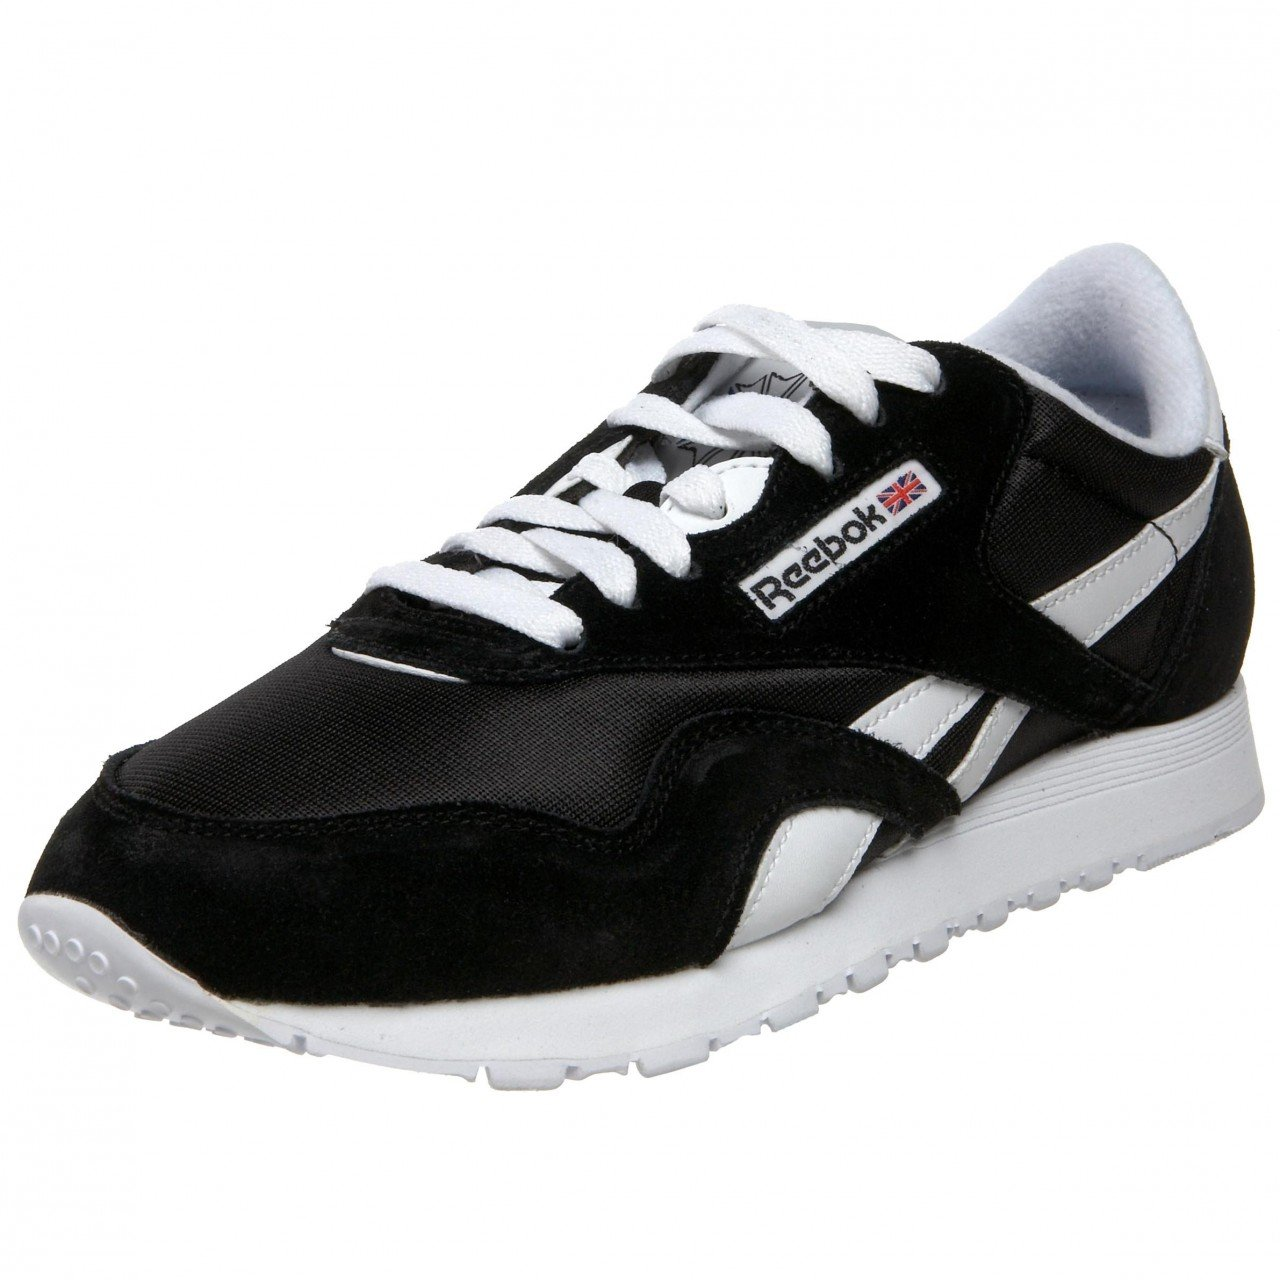 Reebok Damen Classic Nylon Sneakers  40 1/2 schwarz/wei?